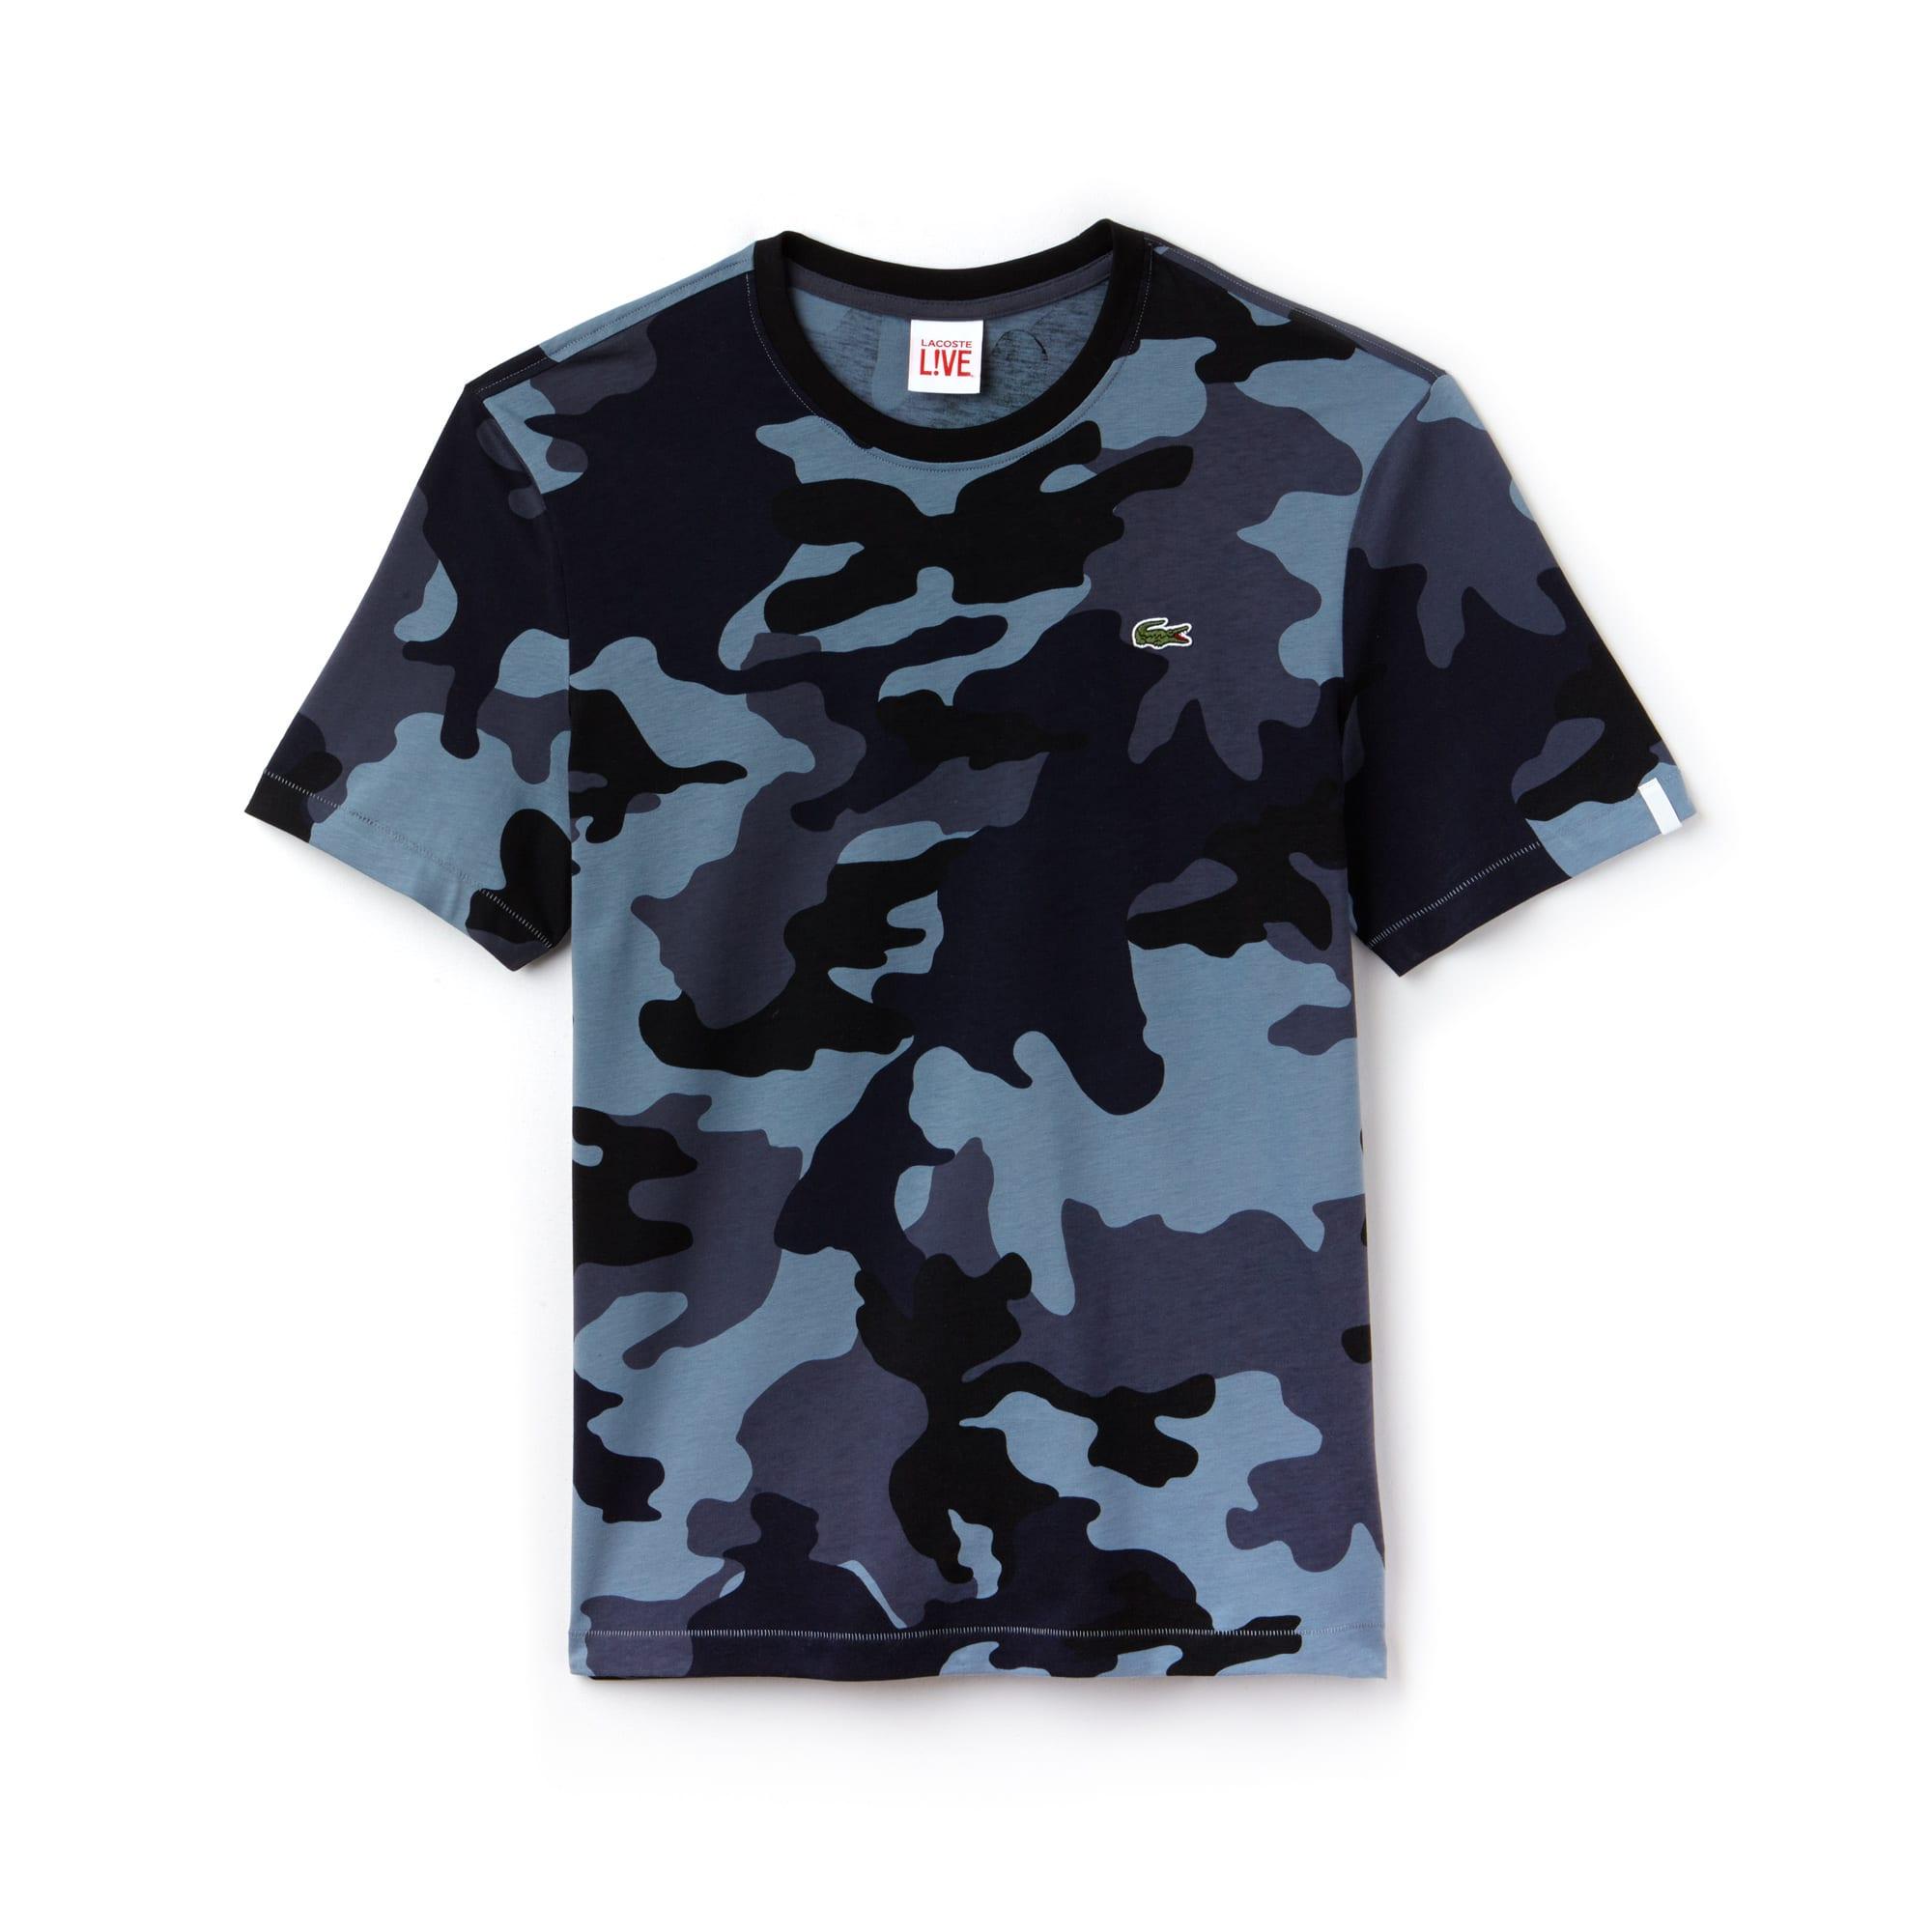 Men's Lacoste LIVE Crew Neck Camouflage Print Jersey T-shirt